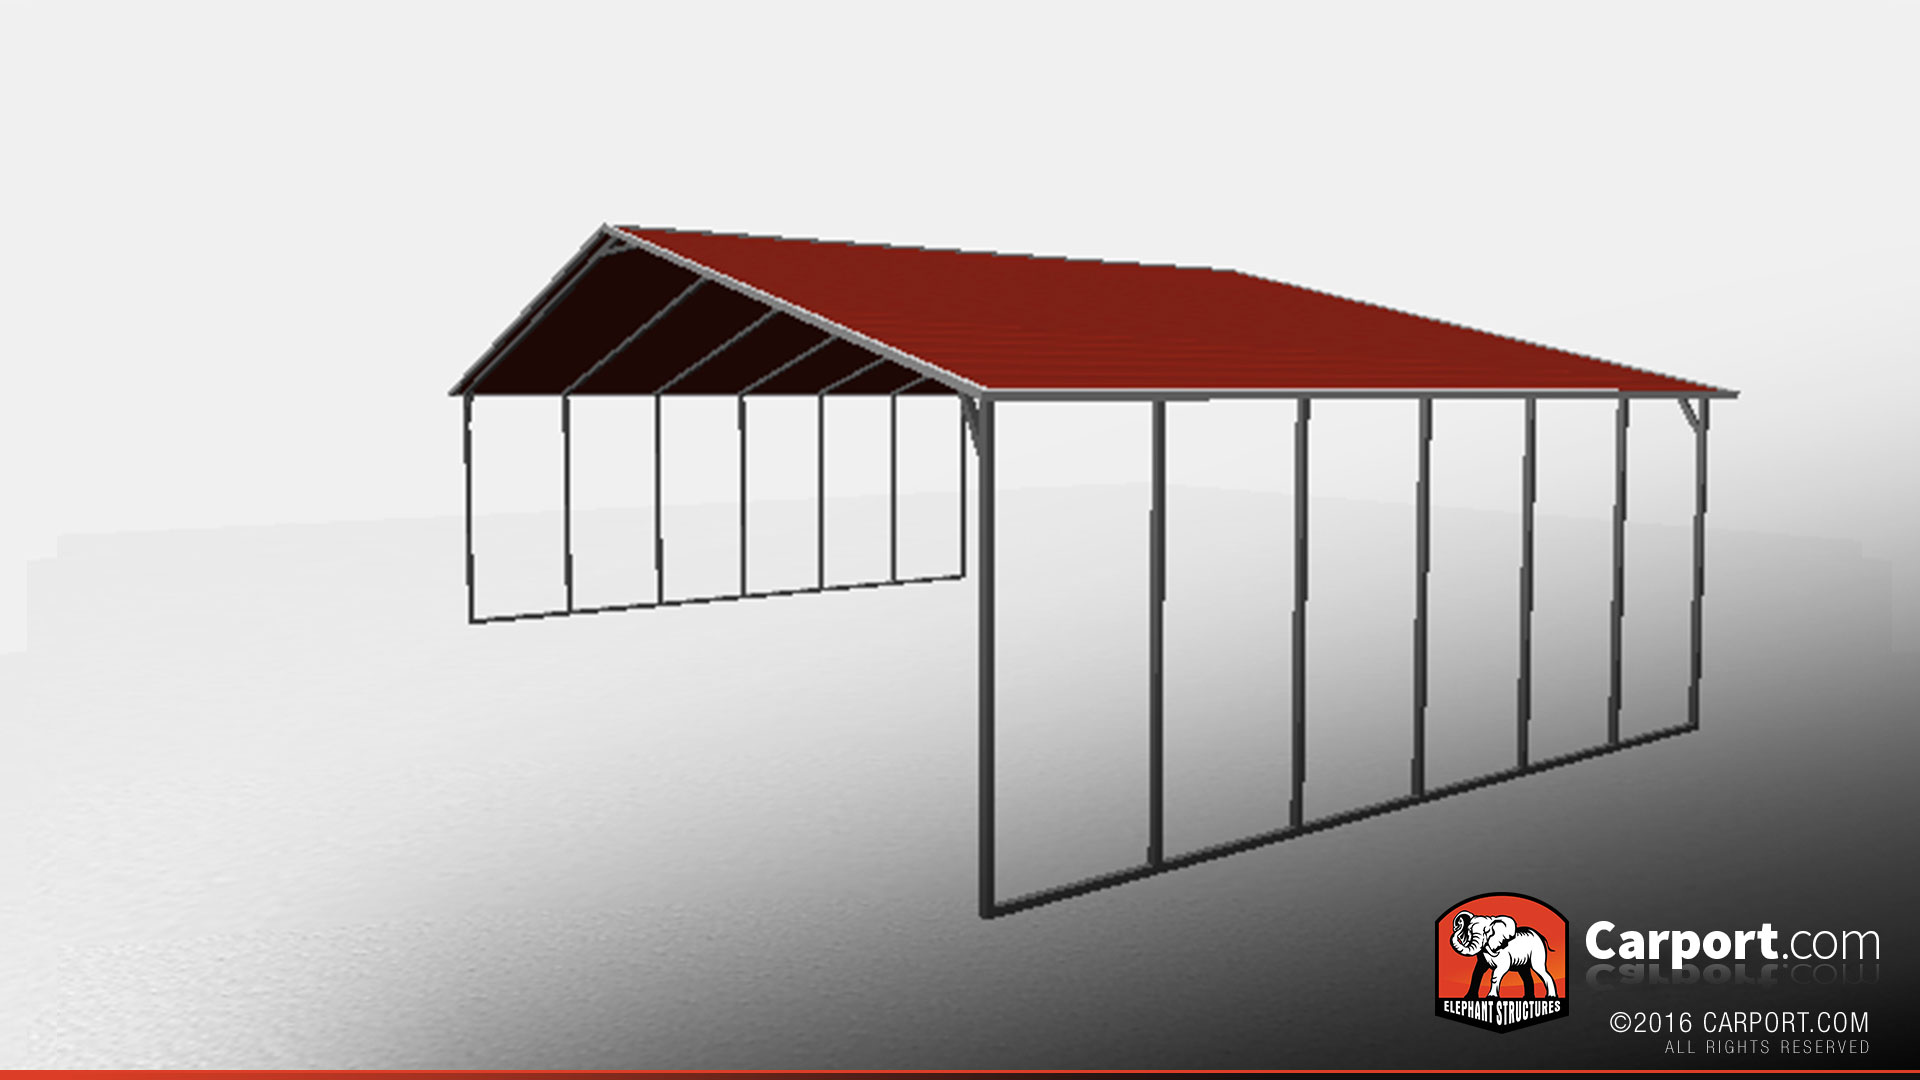 Local Carport Installers Metal Carports : Vertical style commercial metal carport